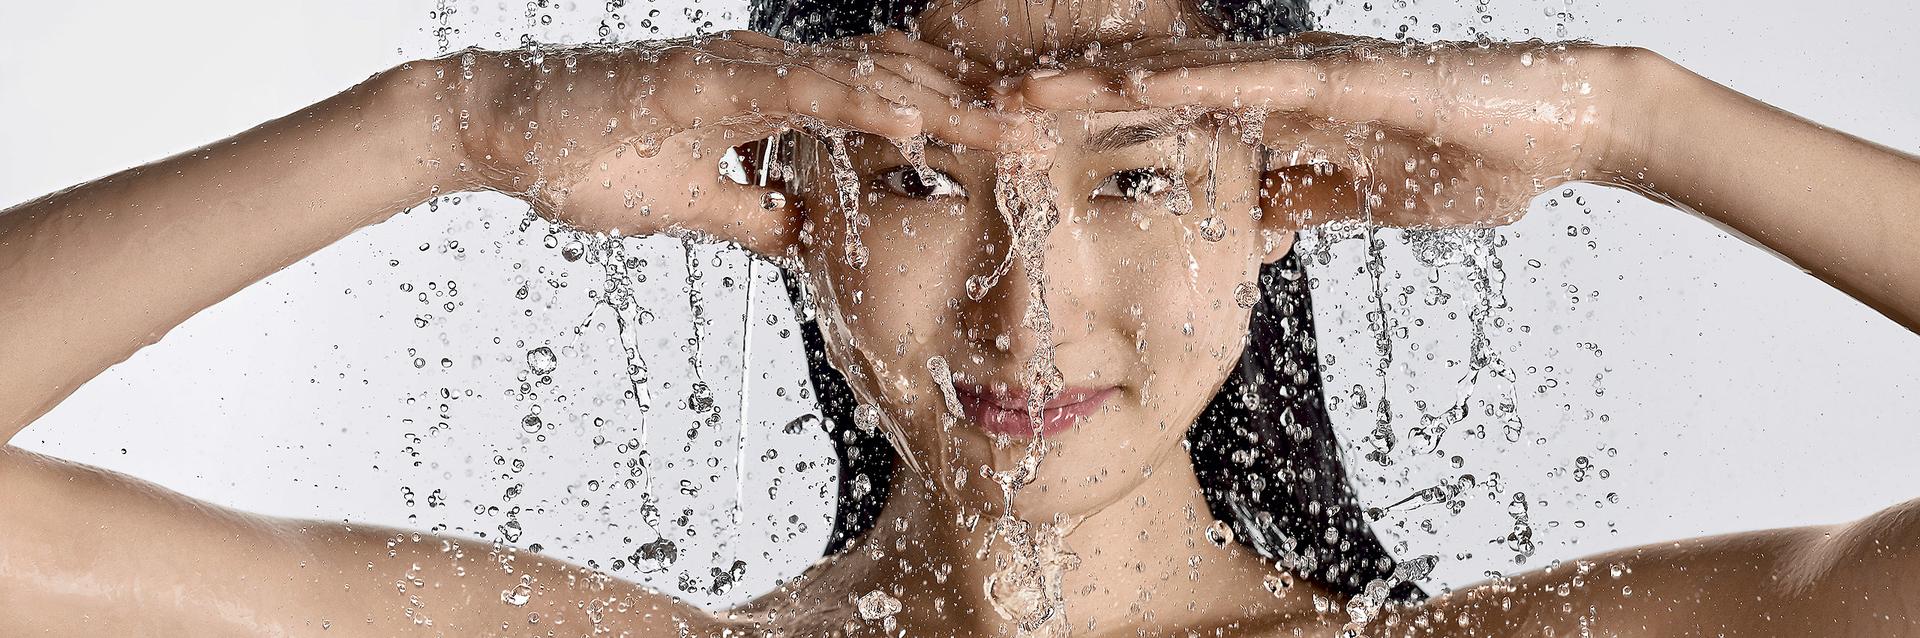 Hansgrohe douchesystemen - Hansgrohe douchesystemen